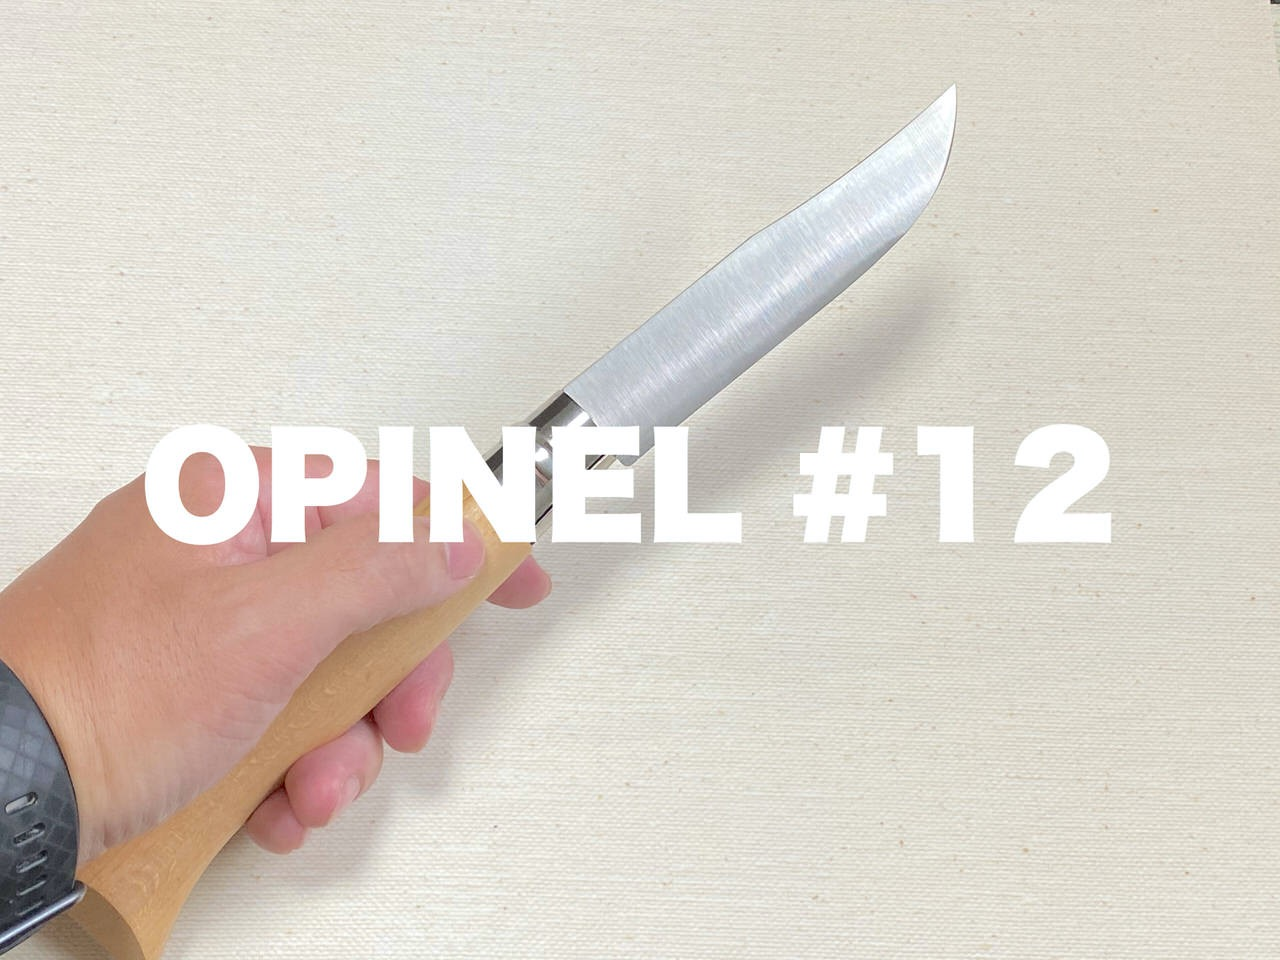 「OPINEL #12」が届いたので試し切り!パンもトマトもスッと切れて良い感じ